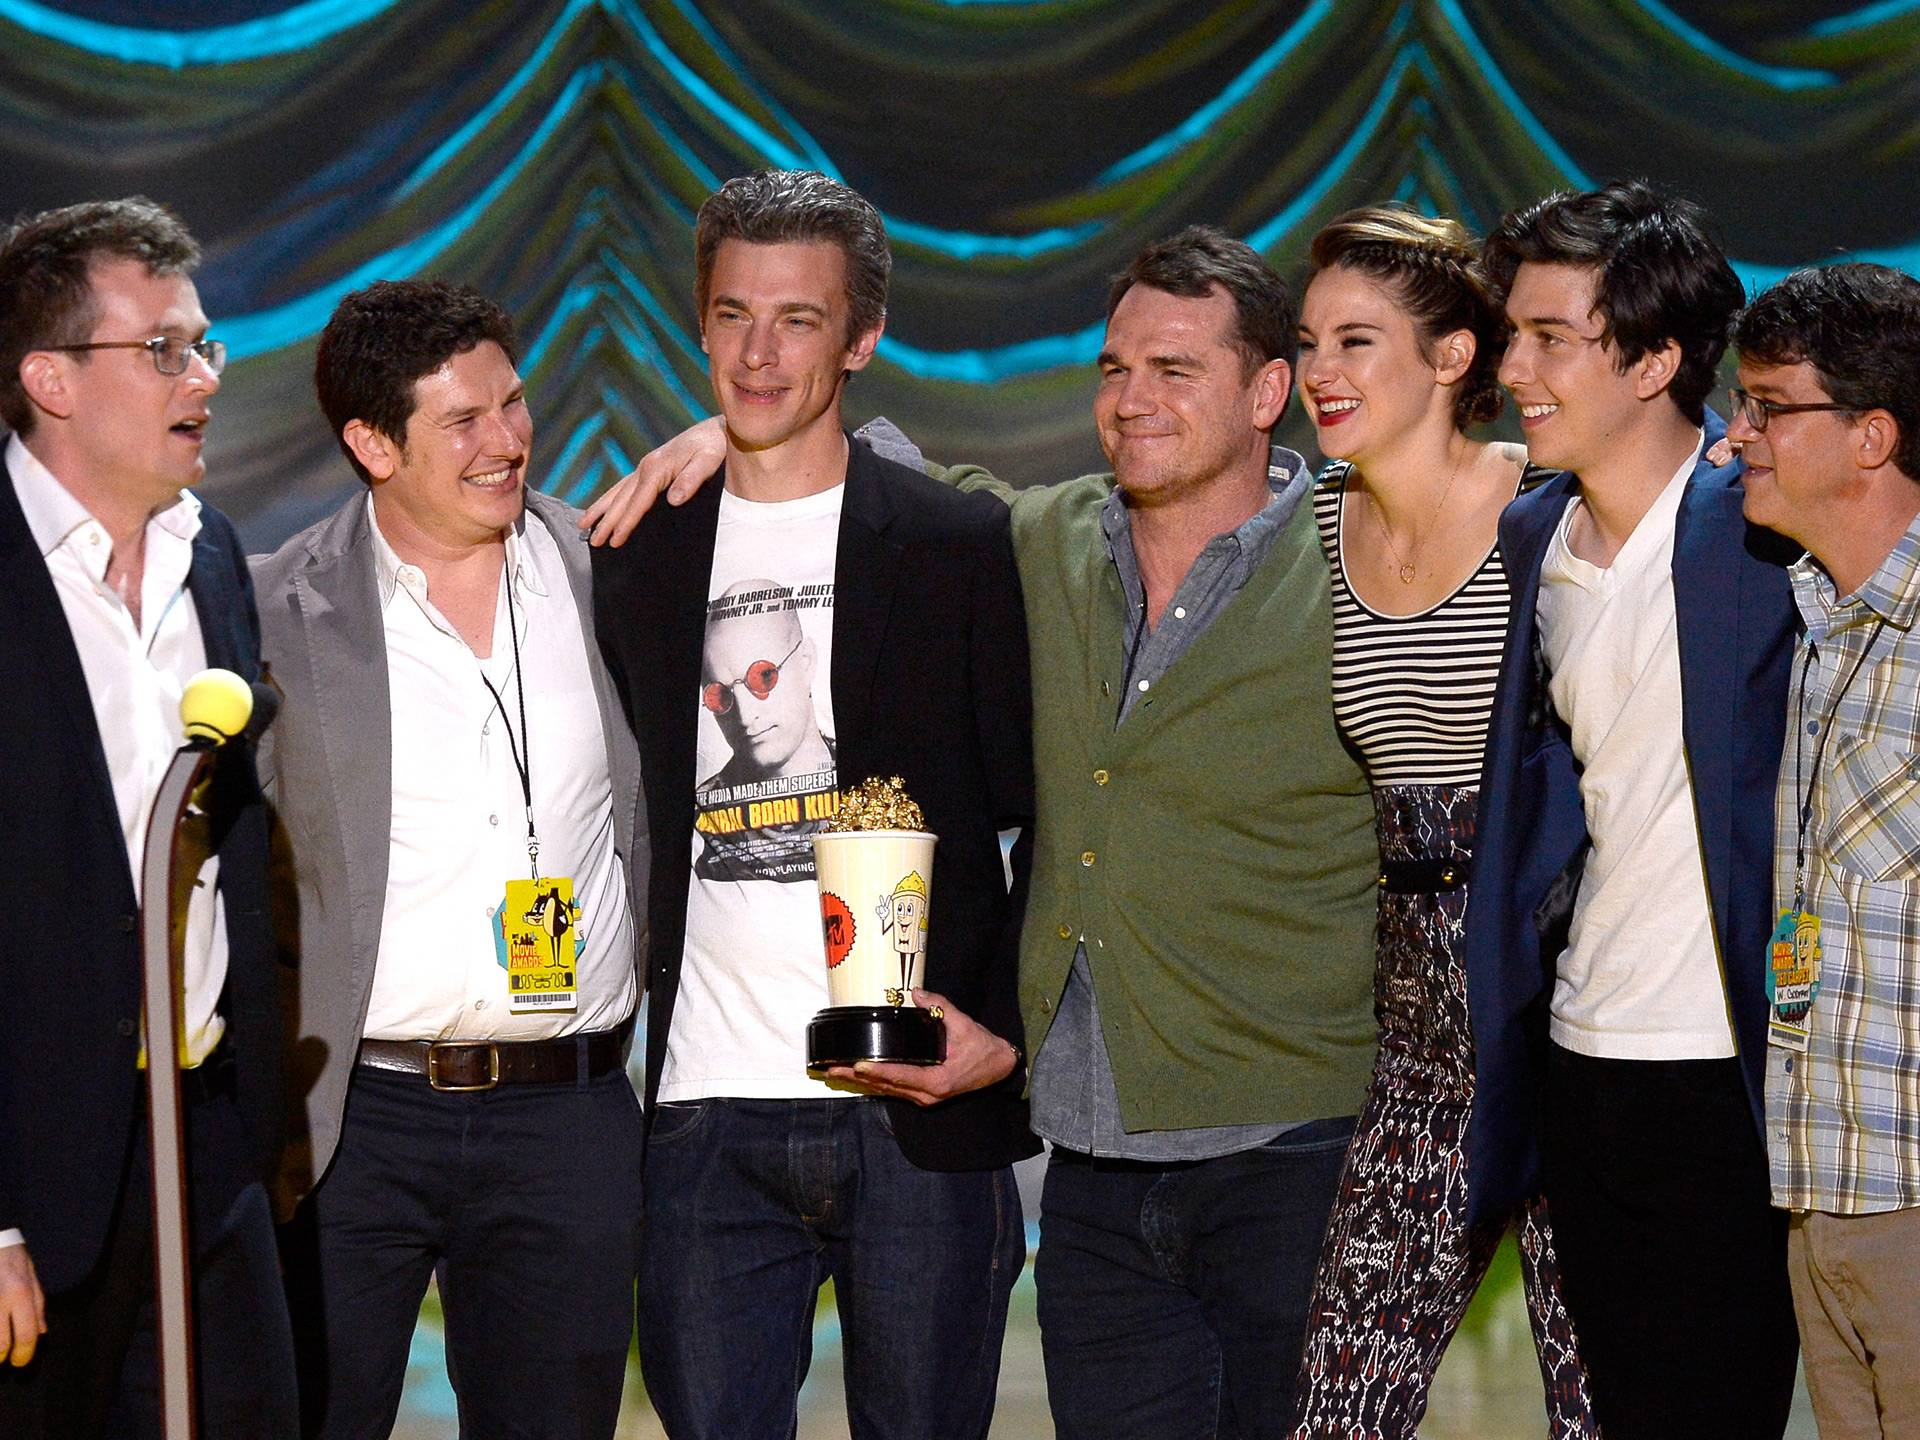 mgid:file:gsp:scenic:/international/mtv-intl/mtv-movie-awards-2015/images/JohnGreen-469530522.jpg